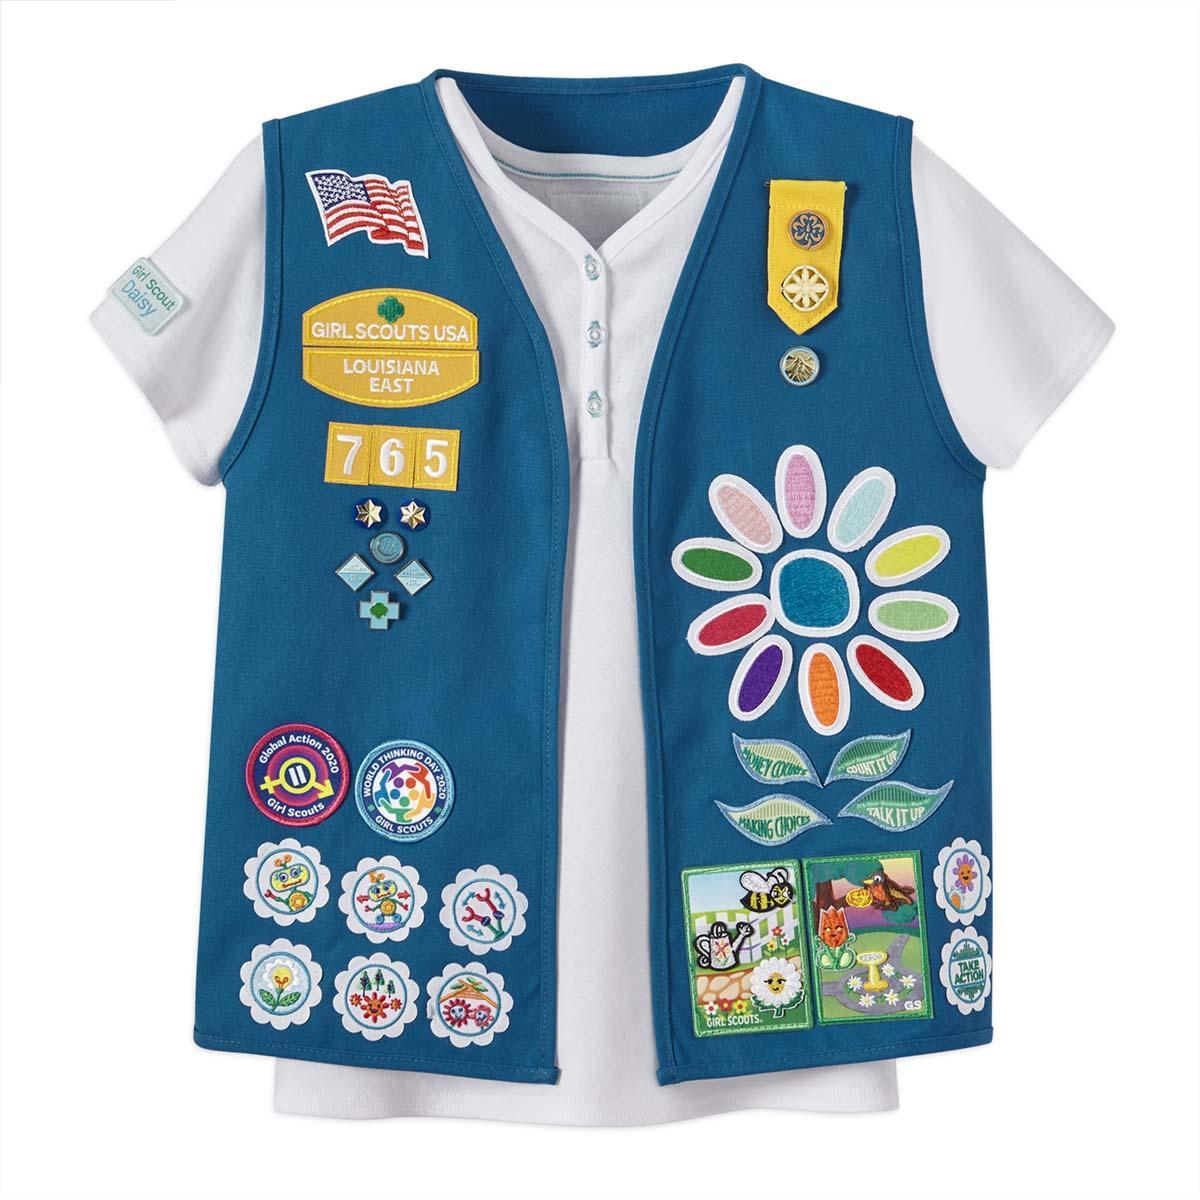 Girl Scout Daisy Henley